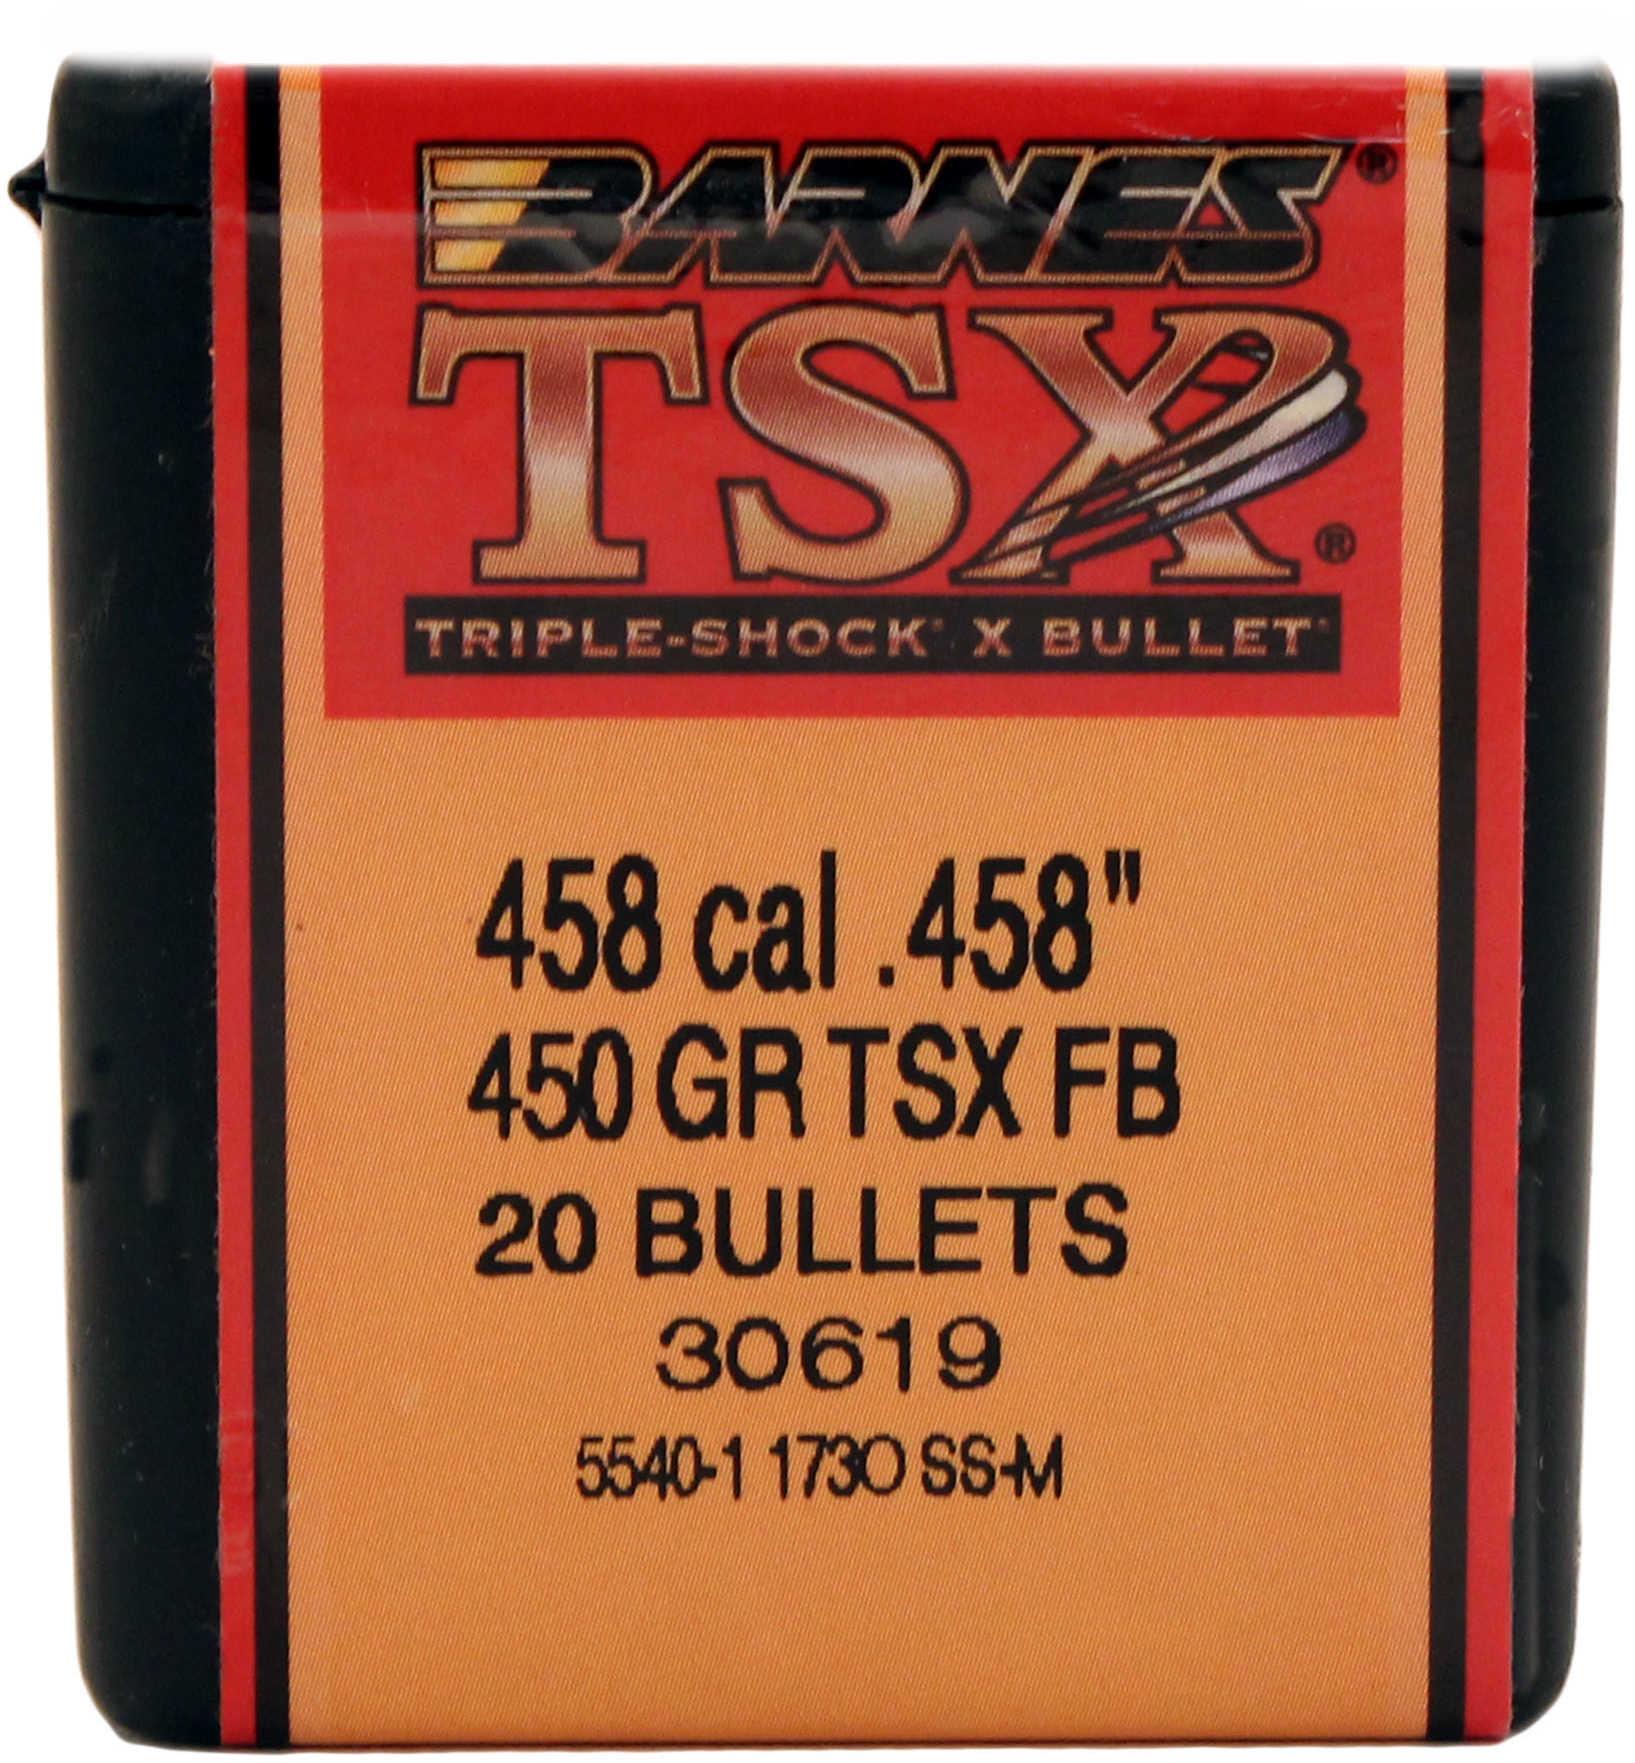 Barnes 458 Caliber 450 Grain Triple Shok X Flat Base Per 20 Md: 45819 Bullets